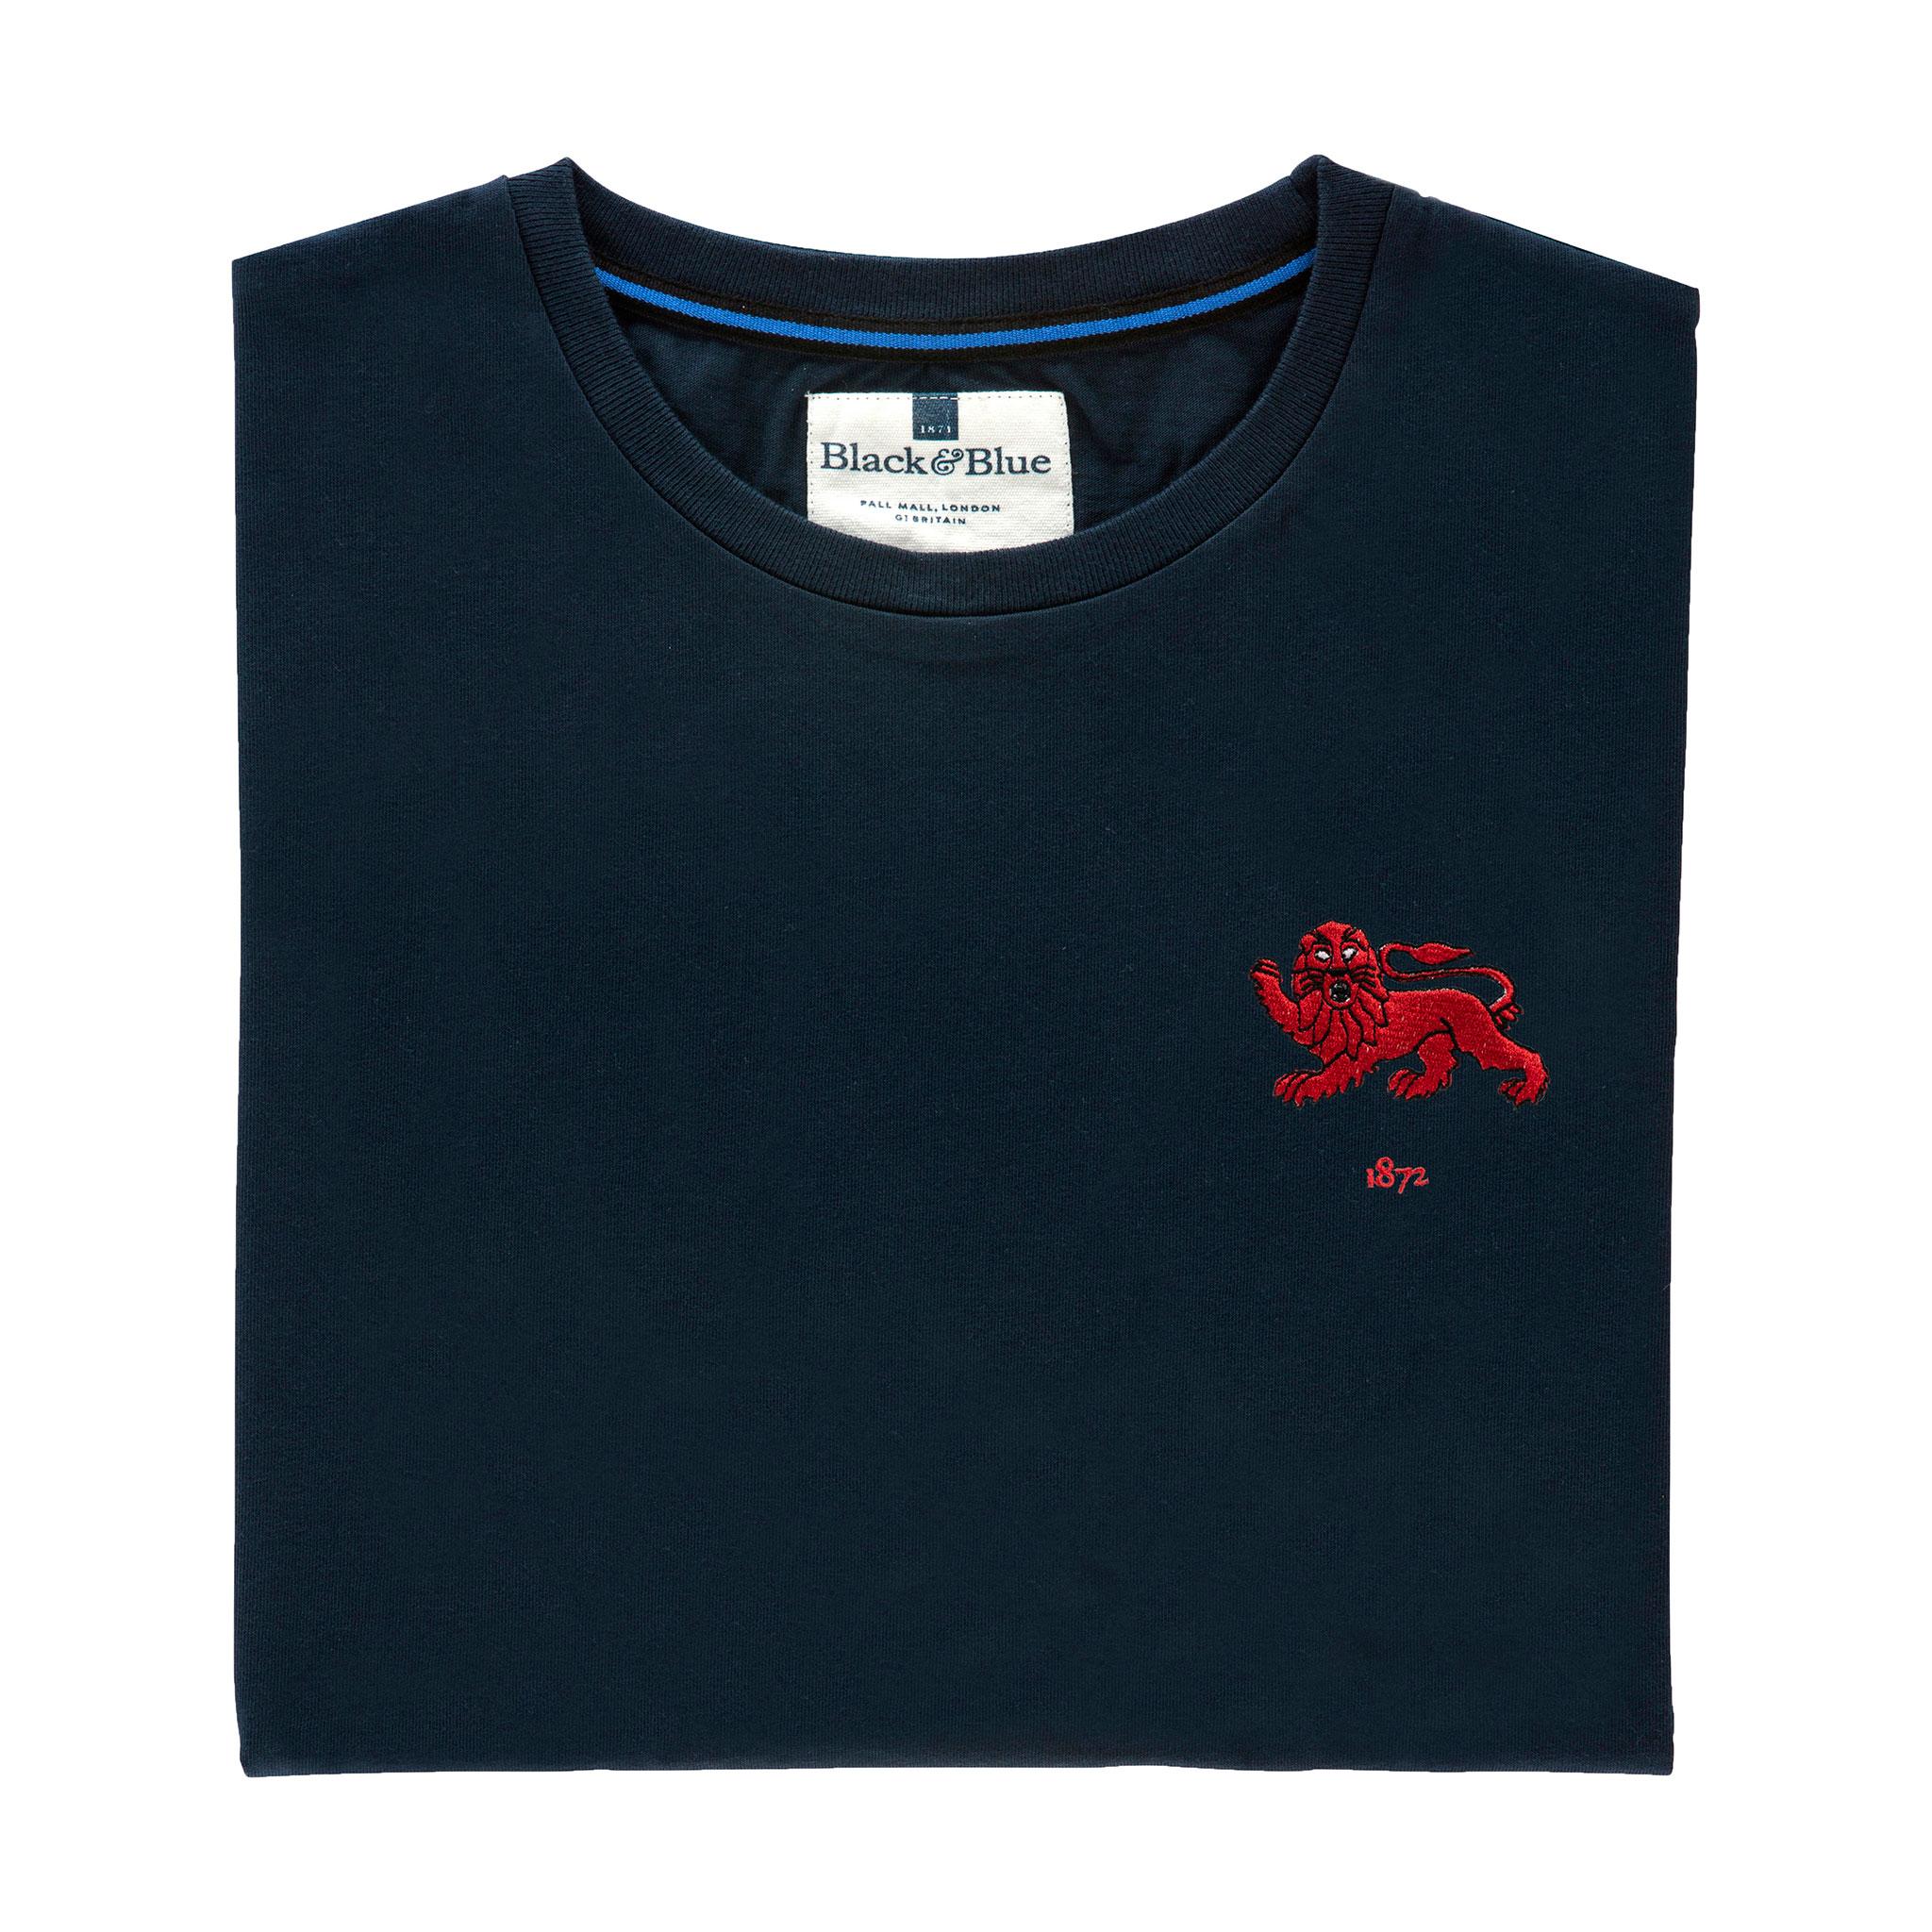 Cambridge 1872 Navy Tshirt_Folded